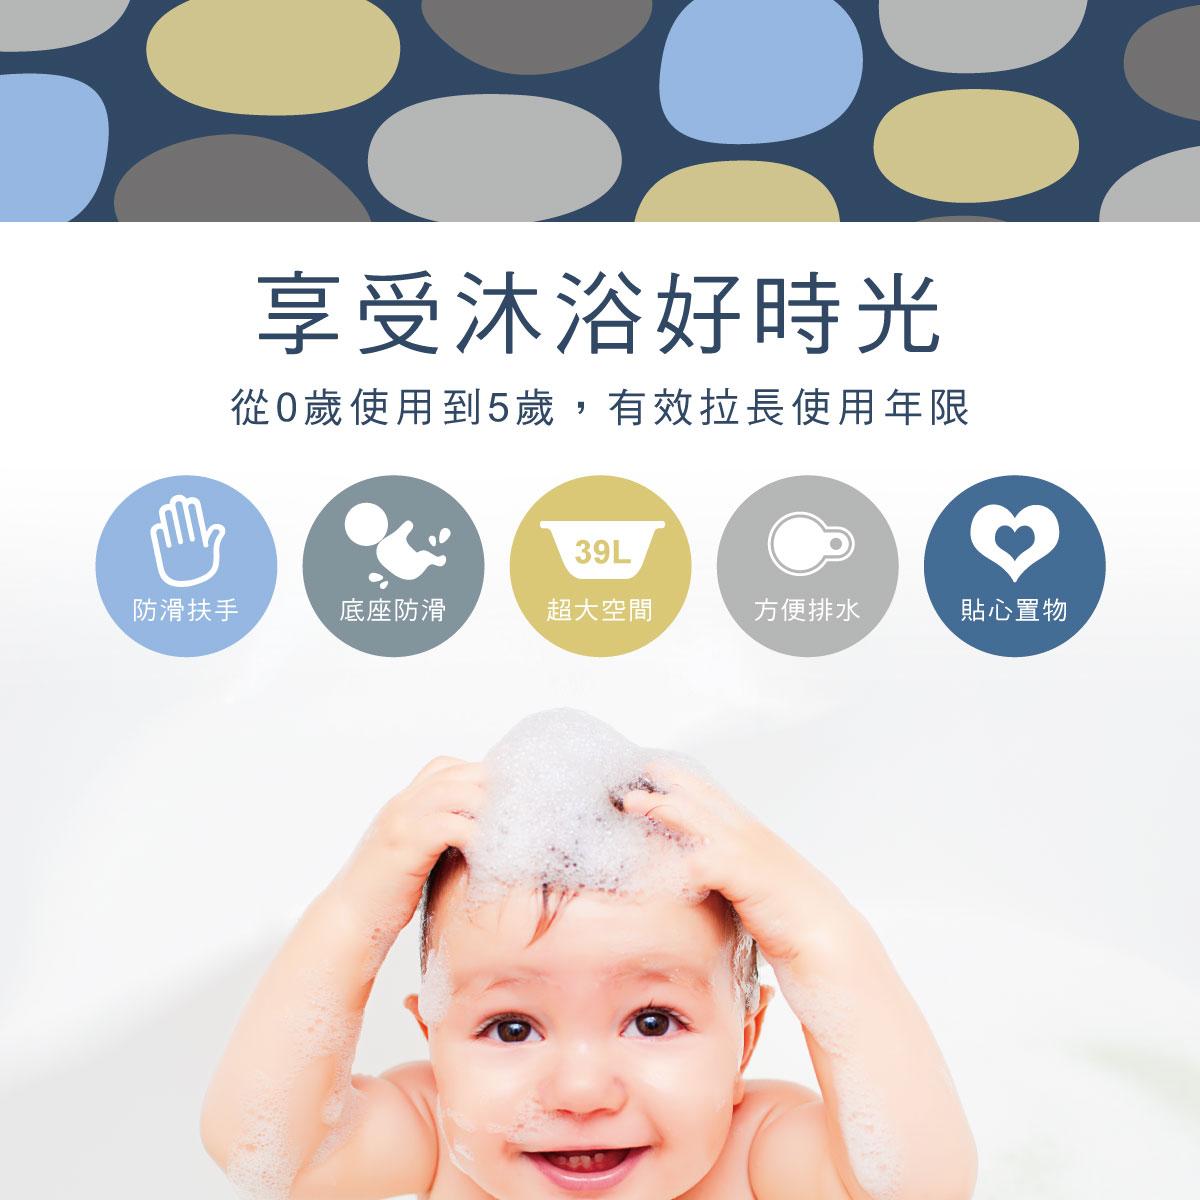 proimages/Bathing&CleanSeries/Bathing/BabyBathTub/1135/1135-成長印記浴盆-EDM-1.jpg